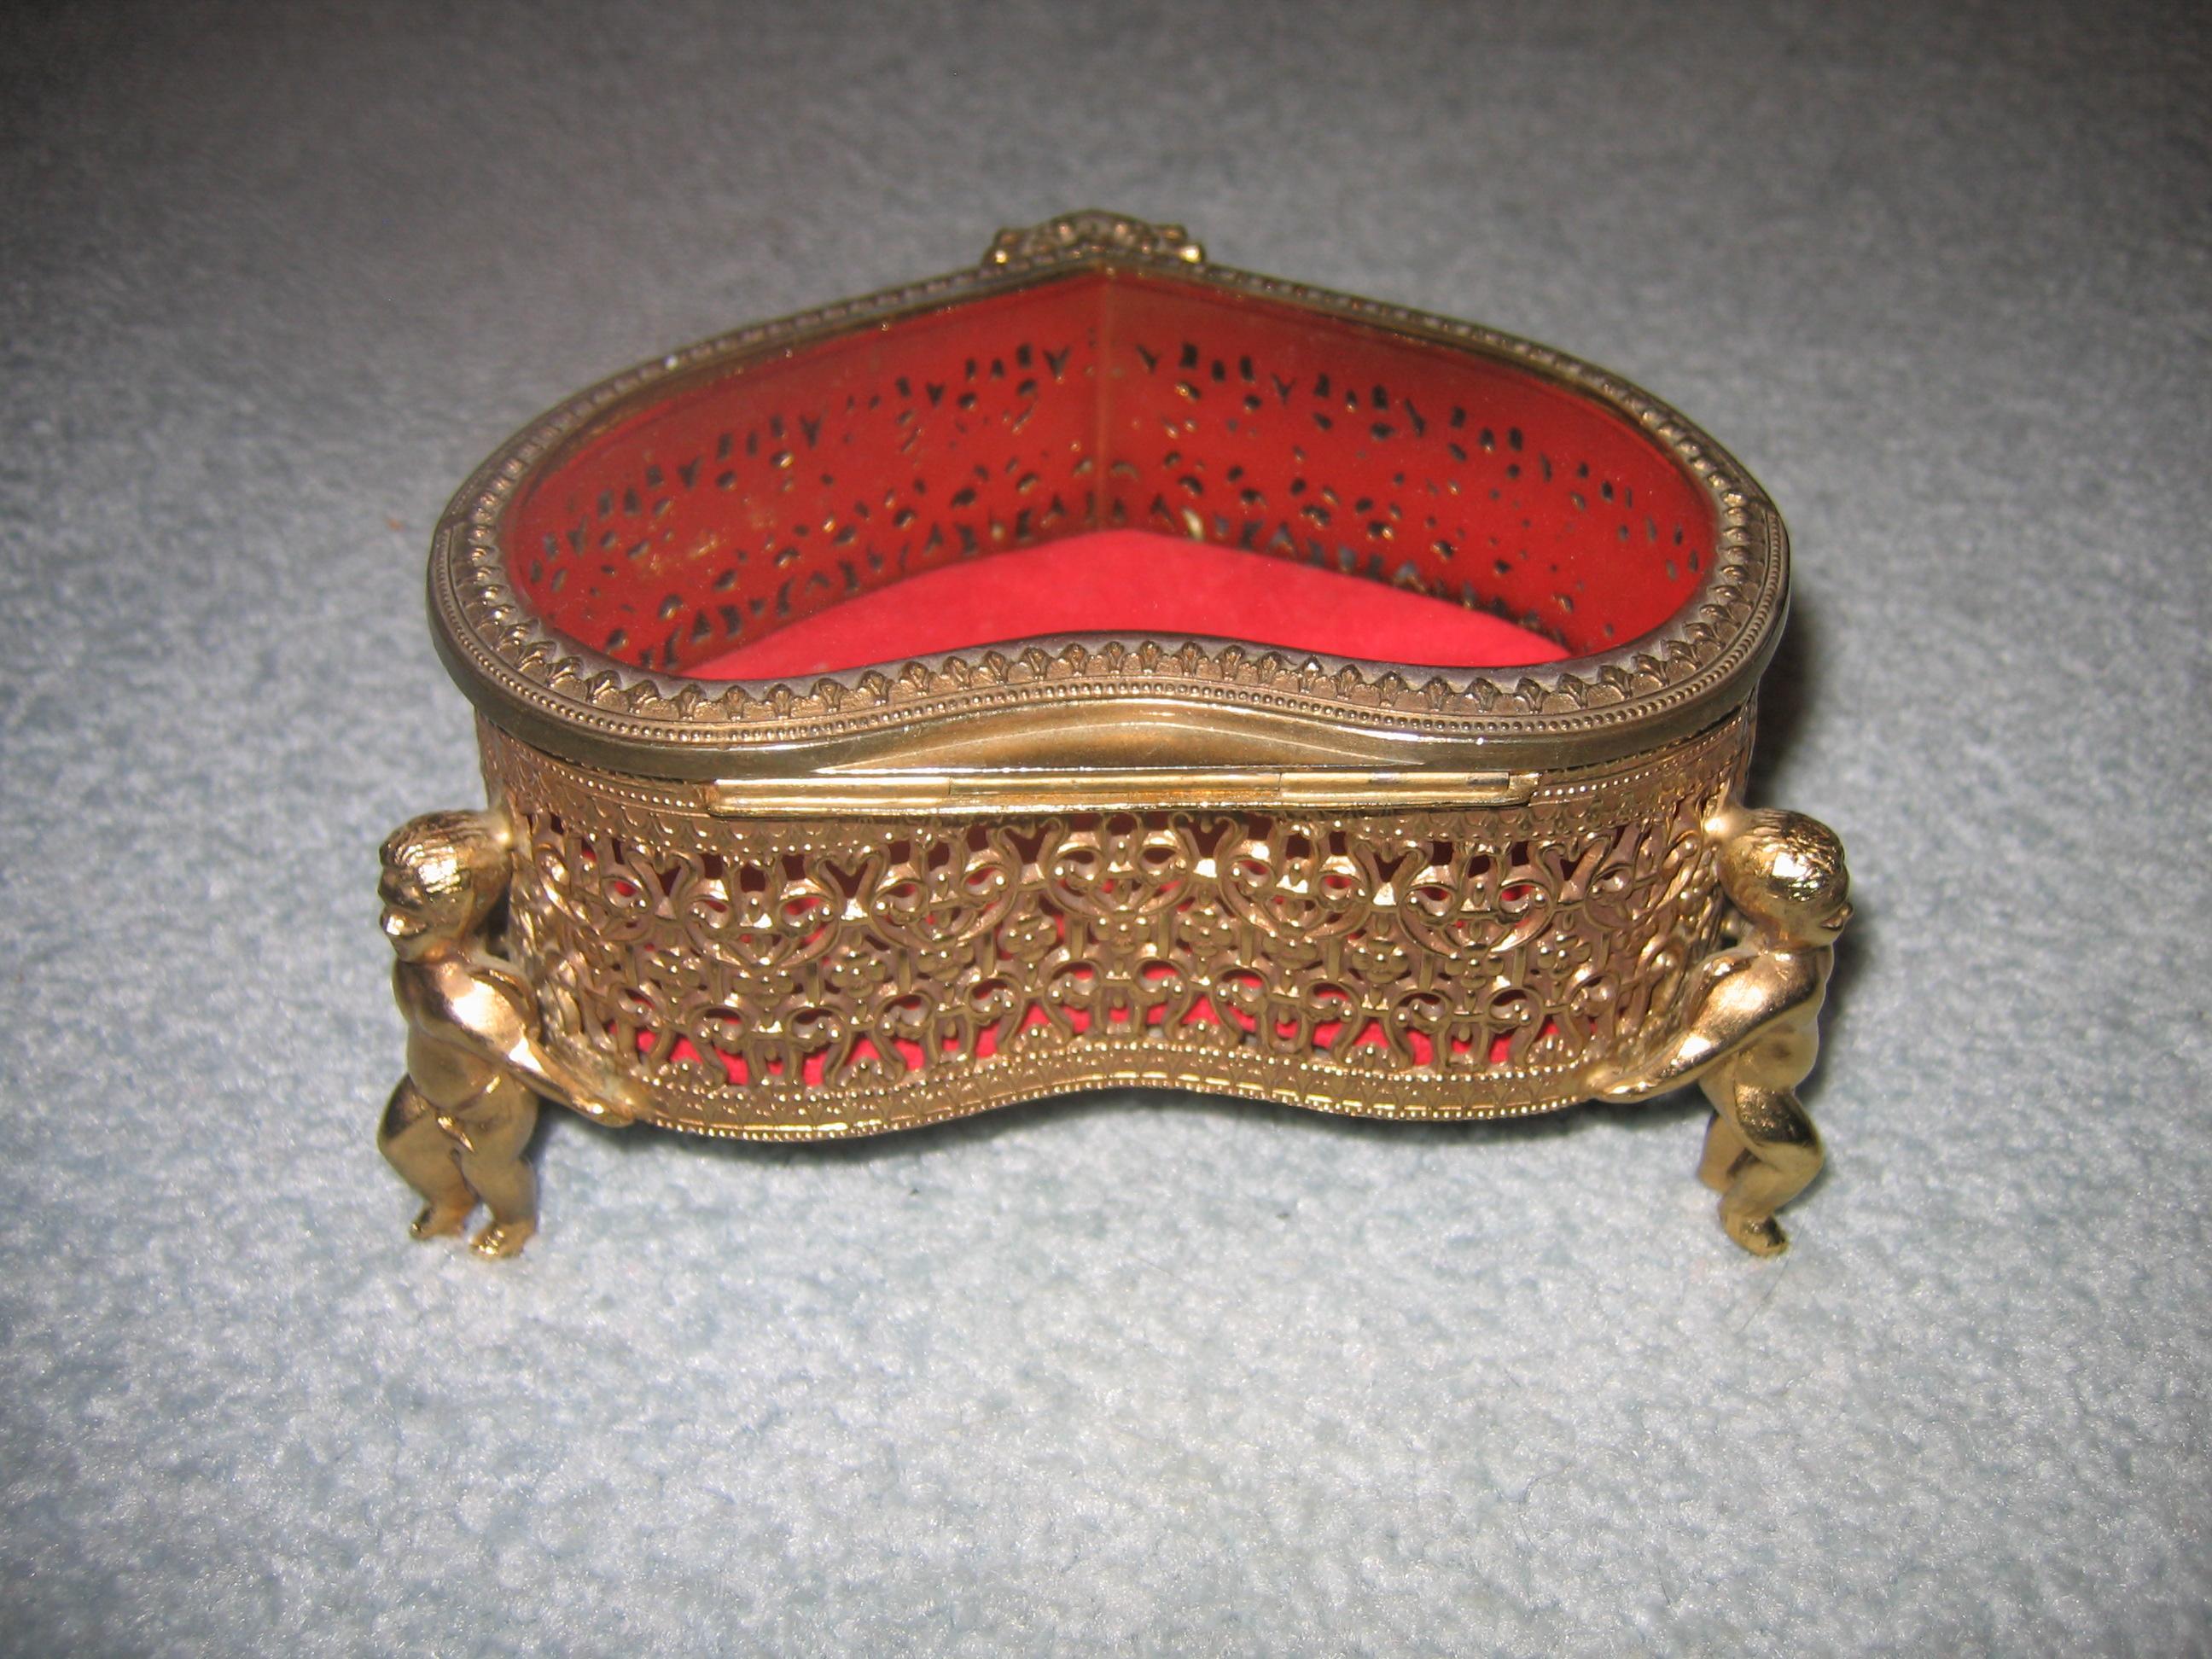 vintage brass heart shaped angel cherub jewelry keepsake box items